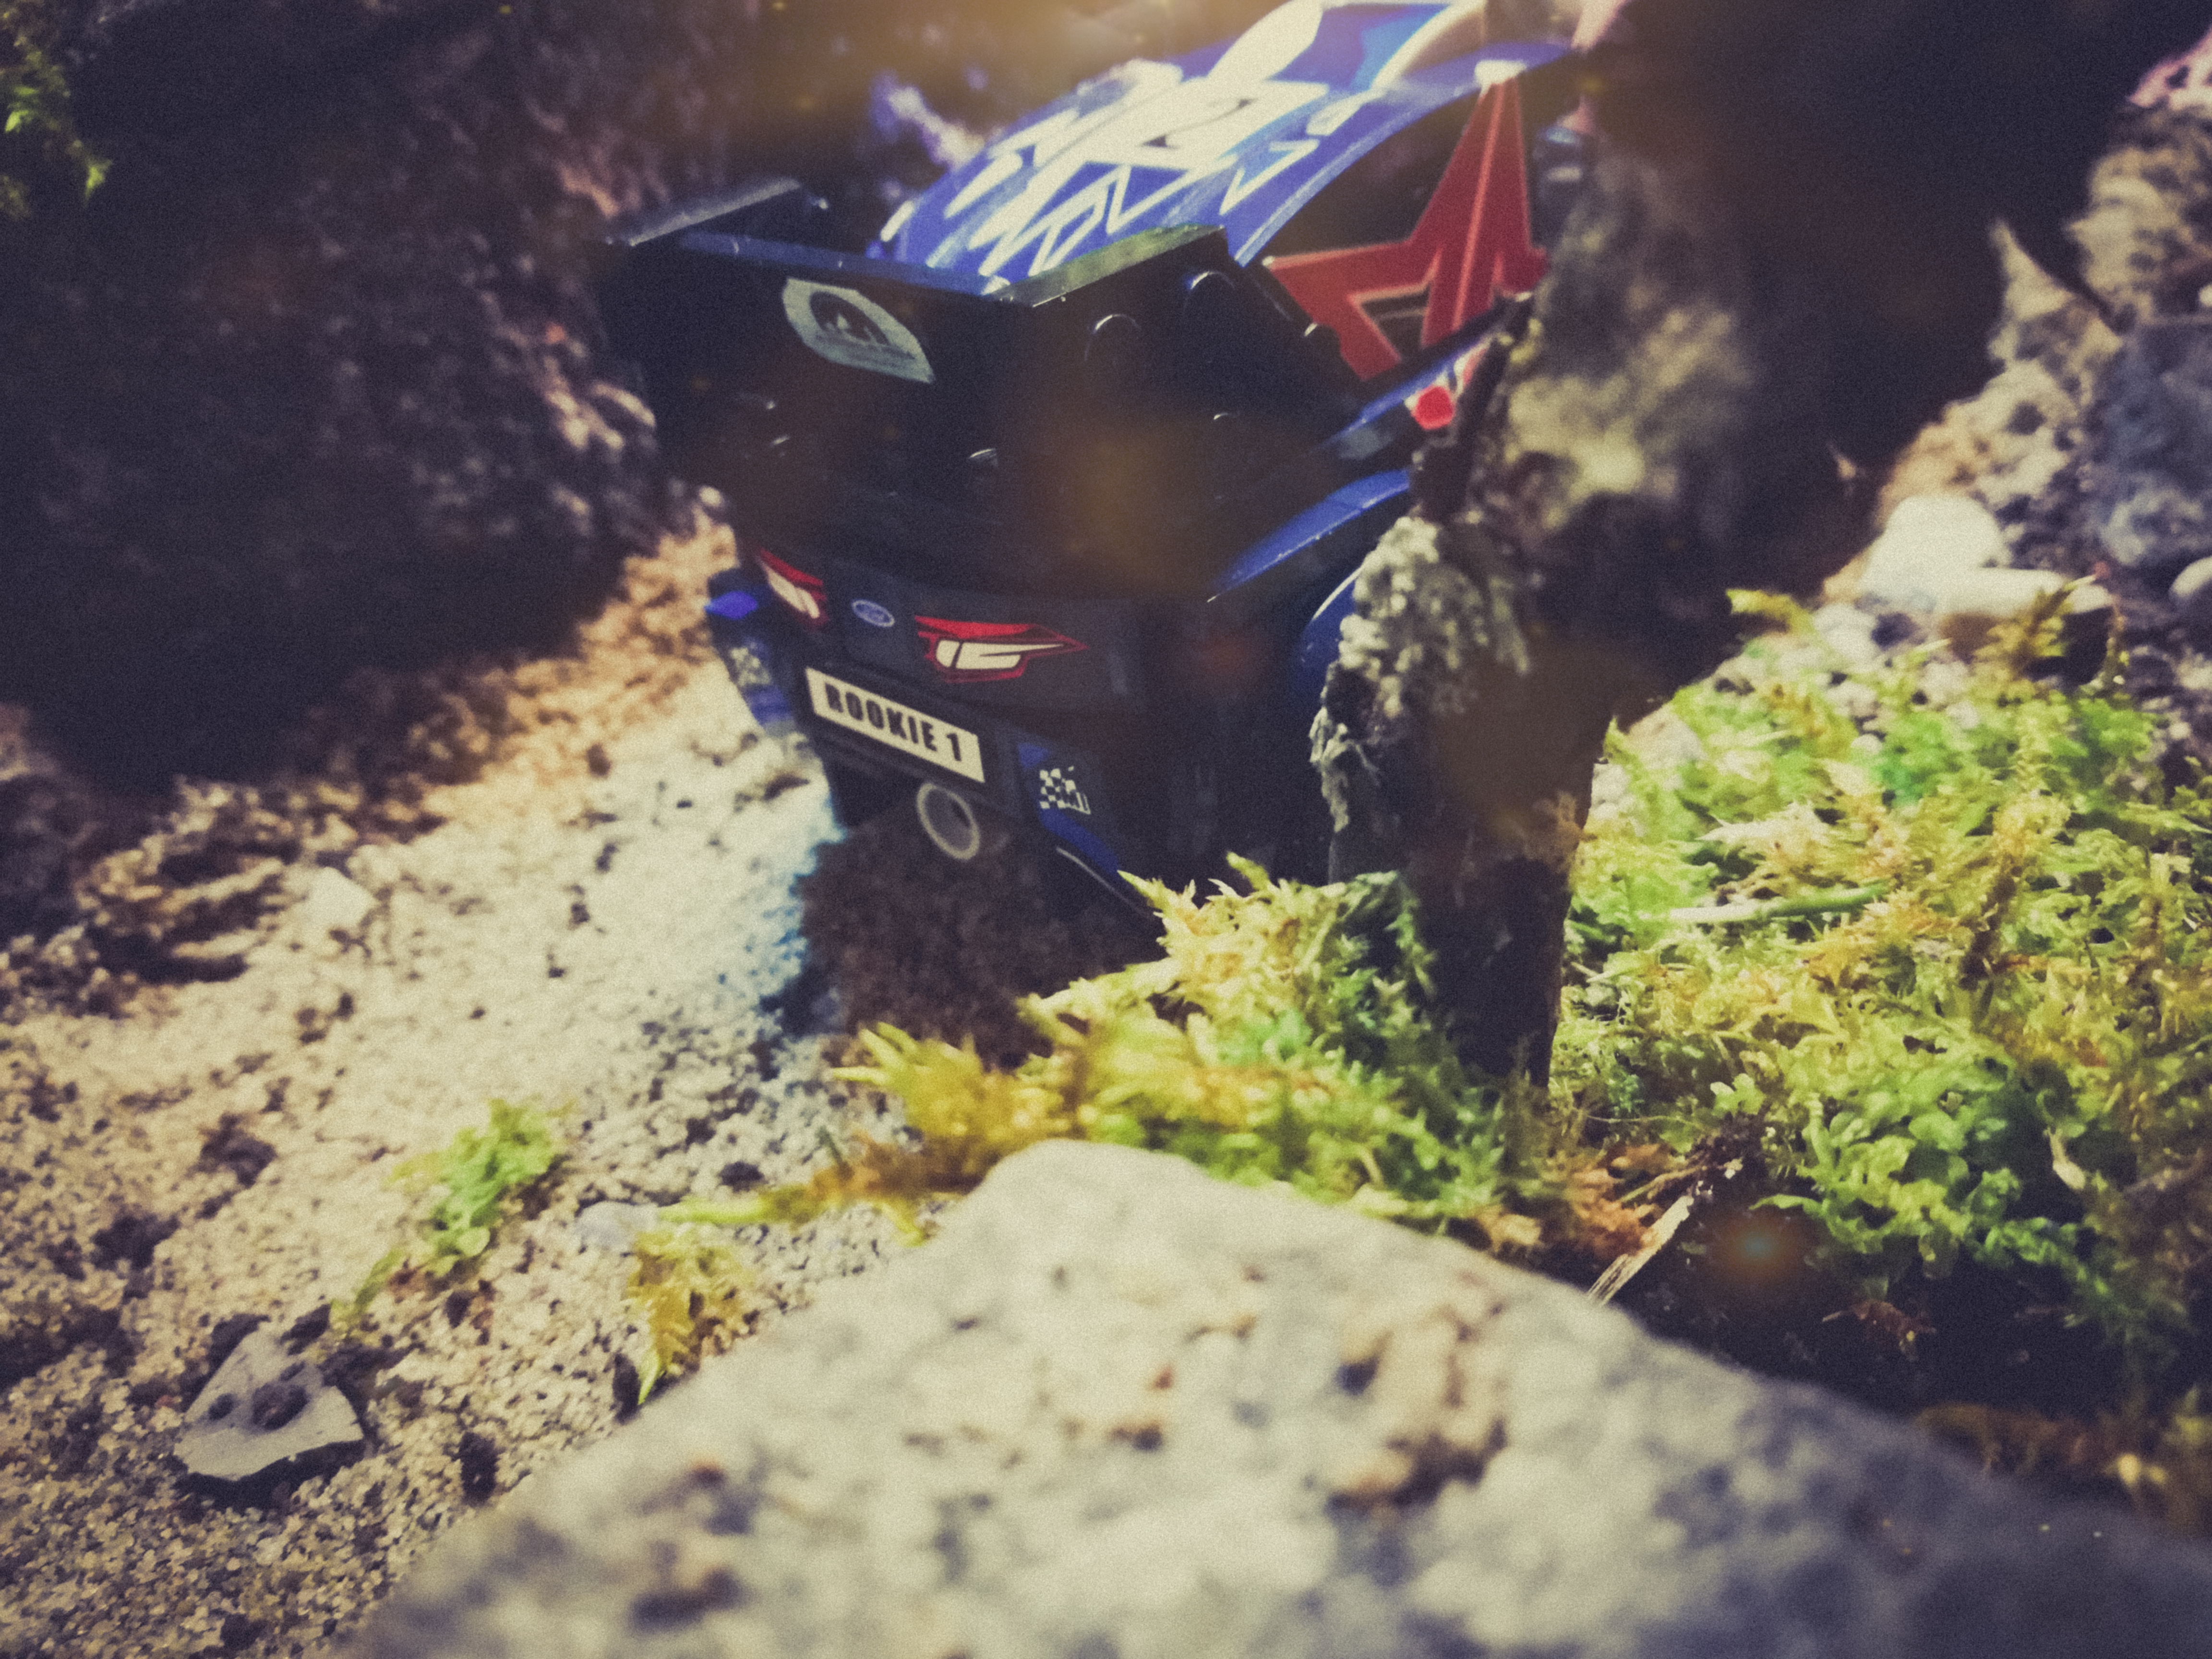 RacingRookie2019_Lego-Ford-Fiesta_Speedchampion_RookieEdition_AUTrenalinStudios-08.jpg